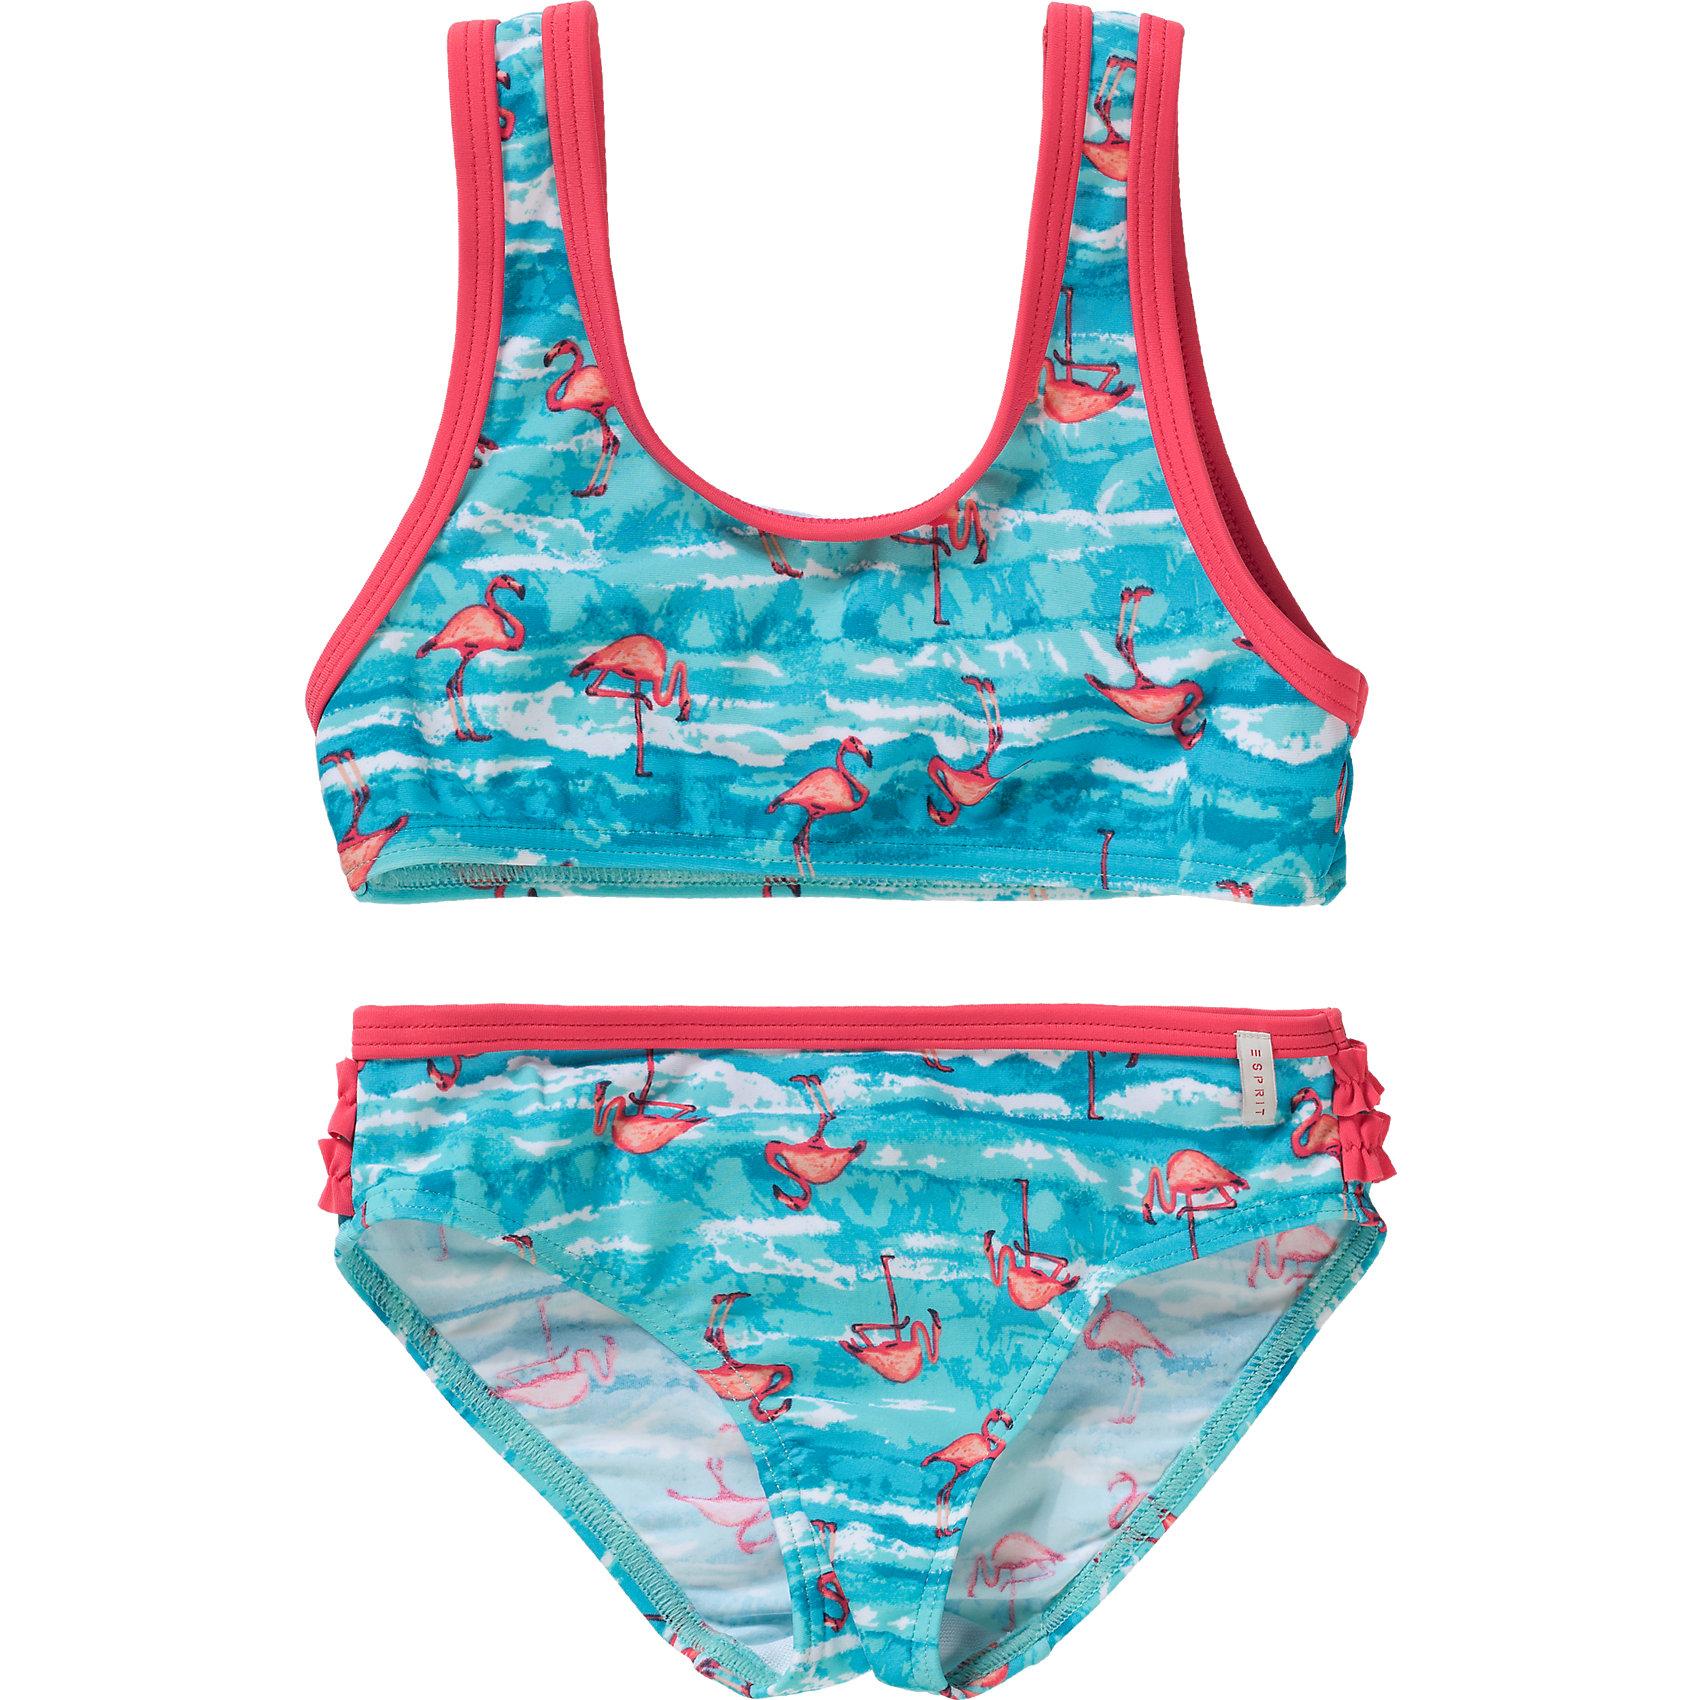 Flamingo 6060042 für Mädchen türkis Neu ESPRIT BODYWEAR Kinder Bikini